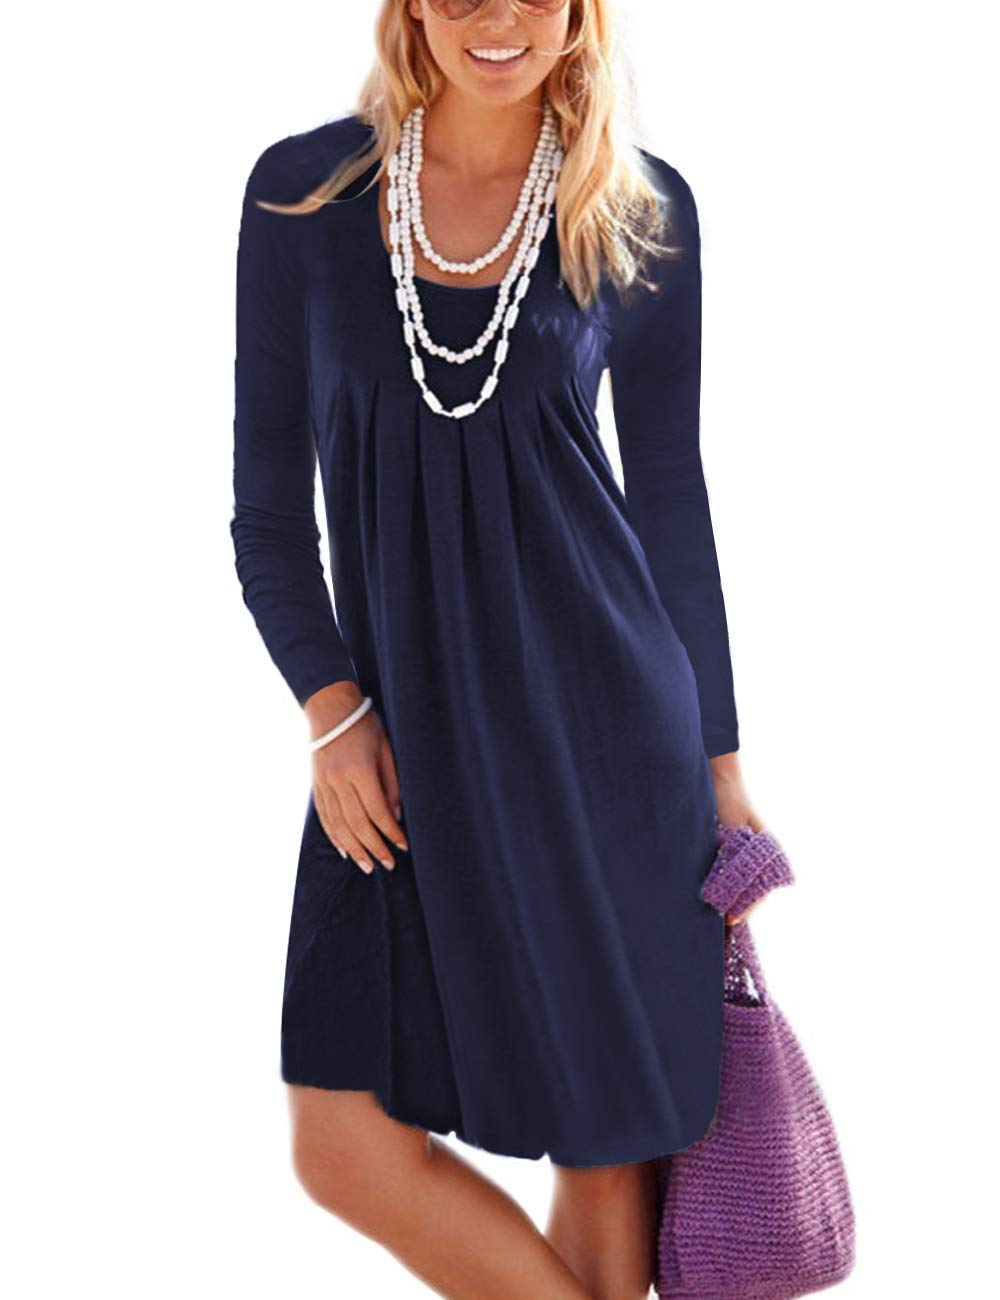 MIDOSOO Womens Casual Long Sleeve Knee Length Vest Pleated Sun Dresses Navy Blue 2XL